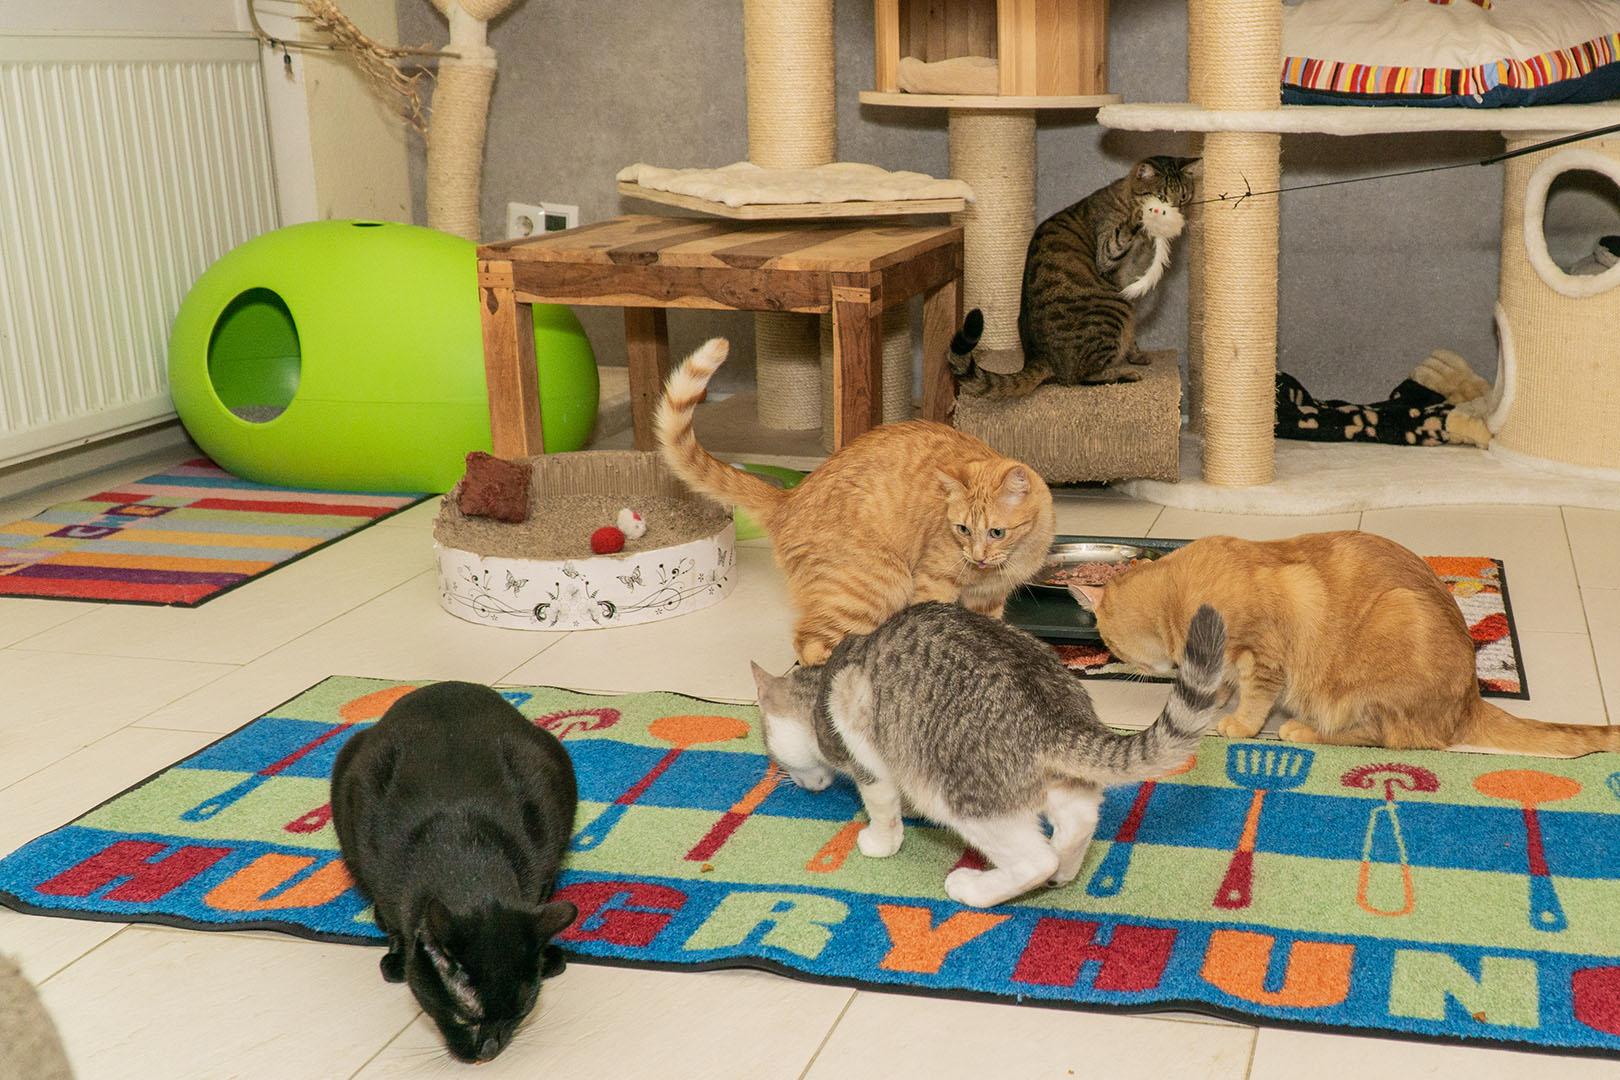 Pflegekatzen Startseite 30.10.18 (8)